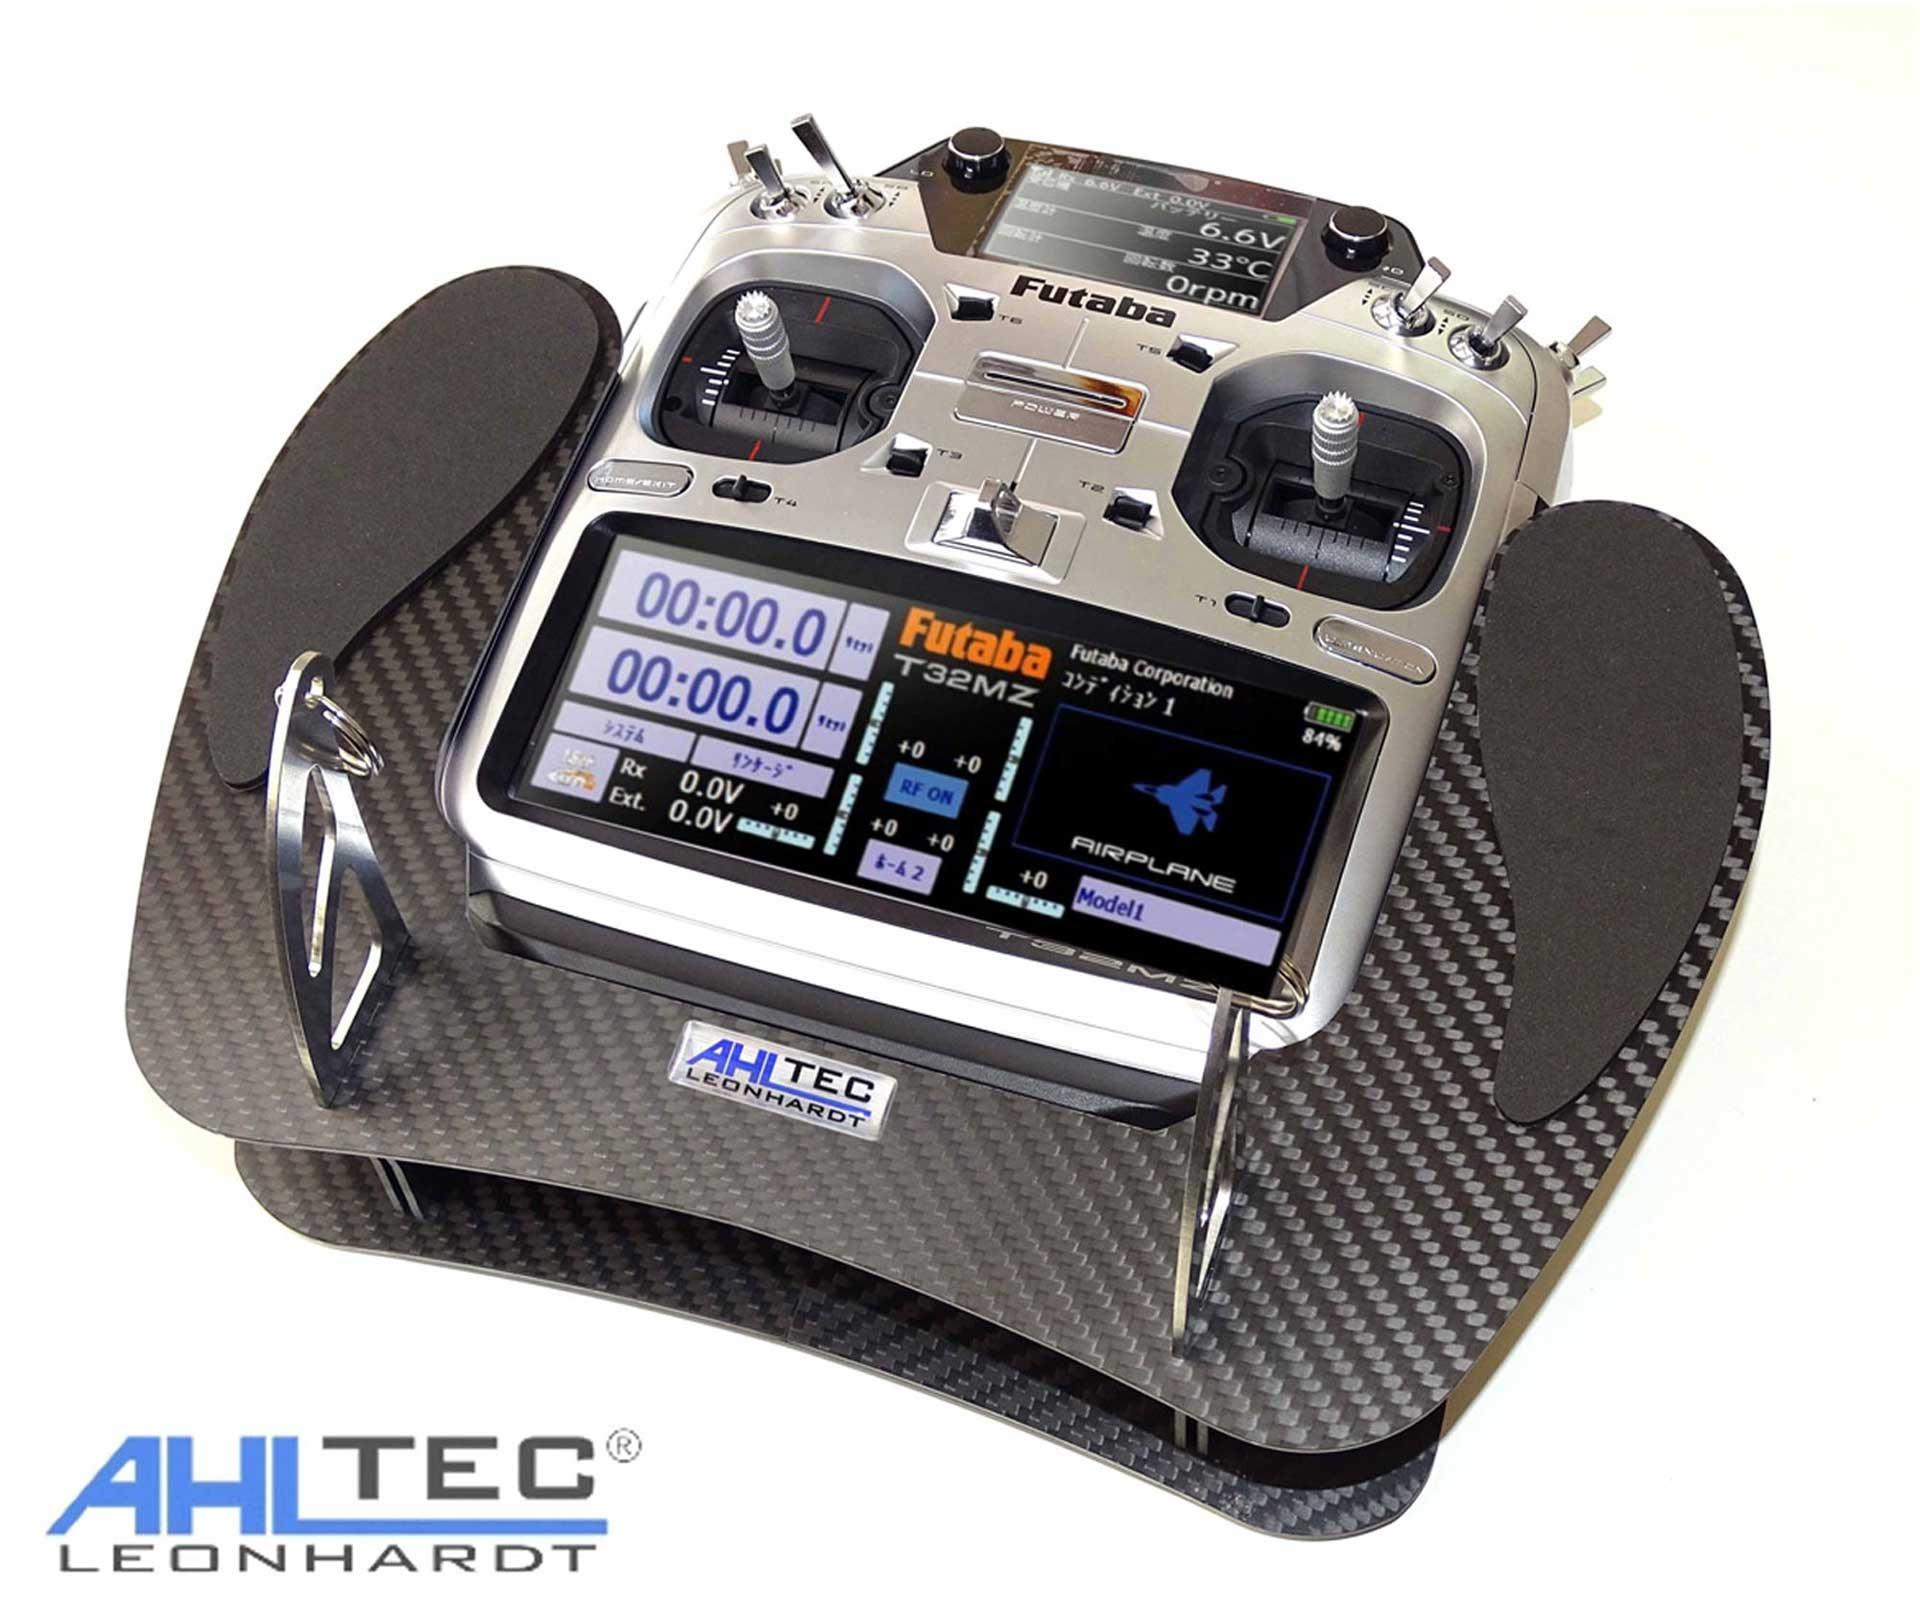 AHLTEC Senderpult Futaba T32MZ Carbon